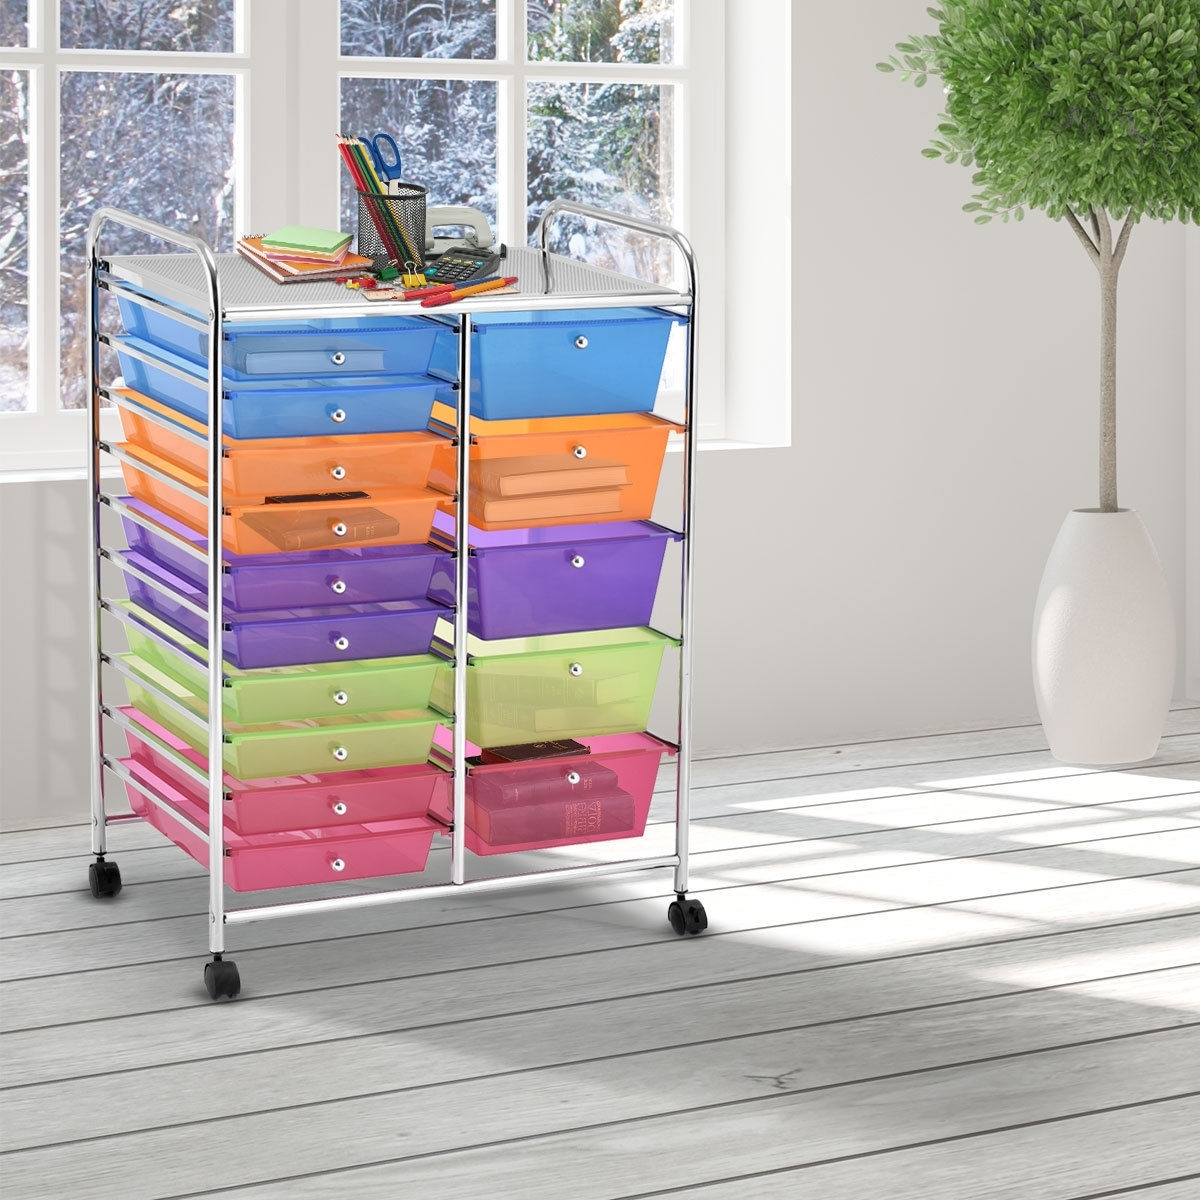 Image of 15-Drawer Utility Rolling Organizer Cart Multi-Use Storage